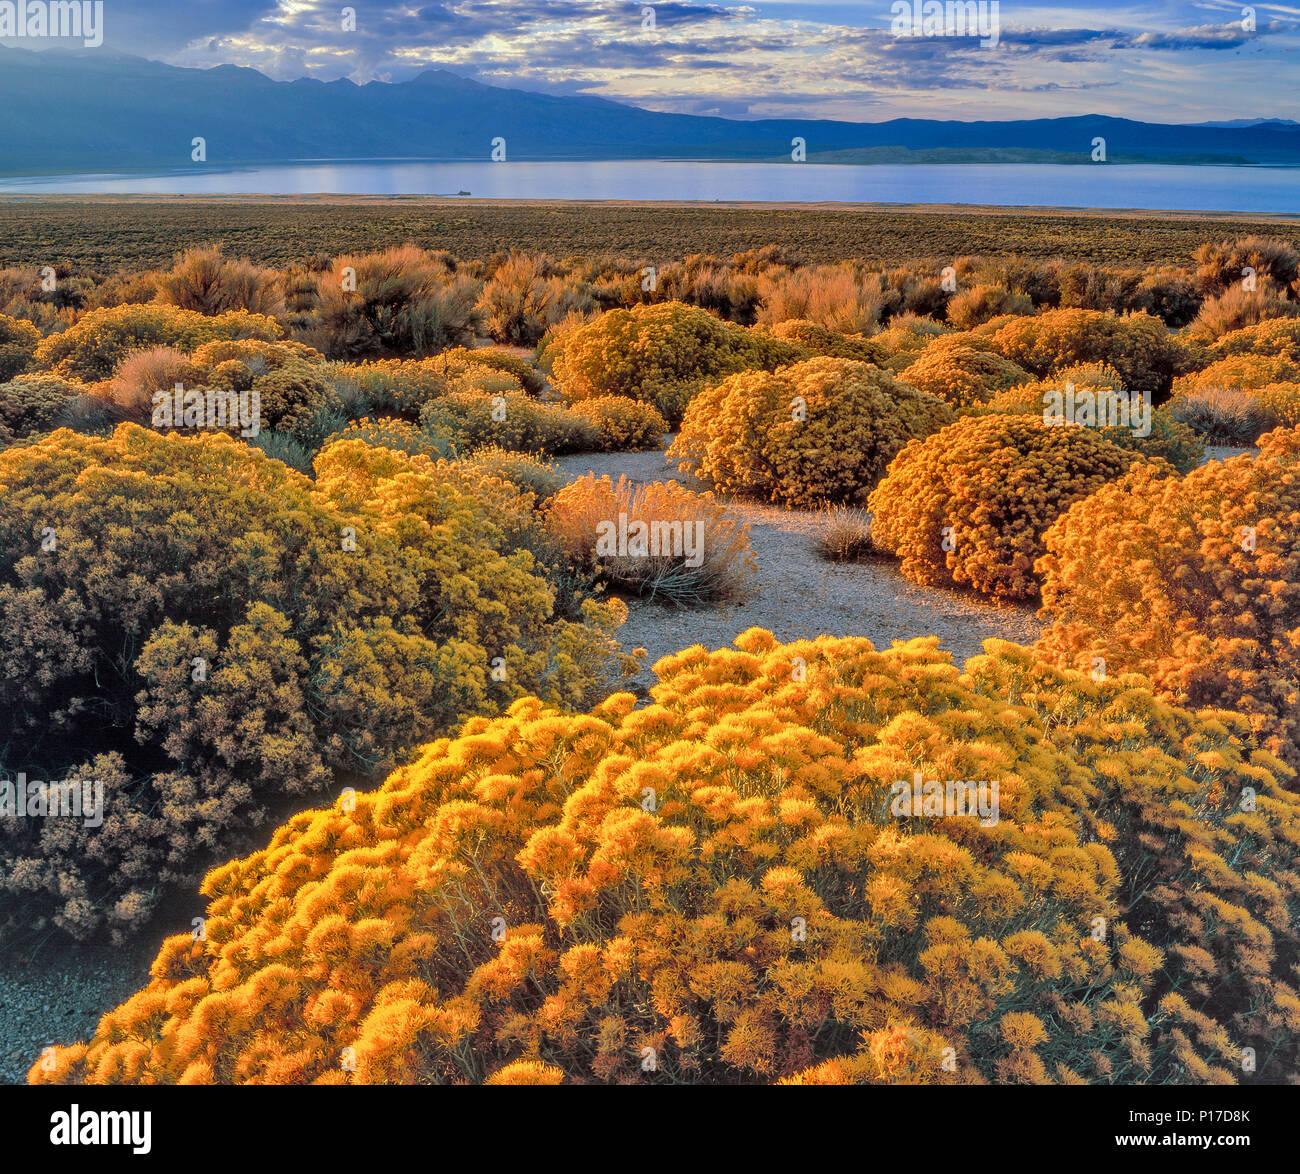 Last Light, Rabbitbrush, Ericameria nauseosa, Mono Lake, Mono Basin National Forest Scenic Area, Inyo National Forest, California - Stock Image